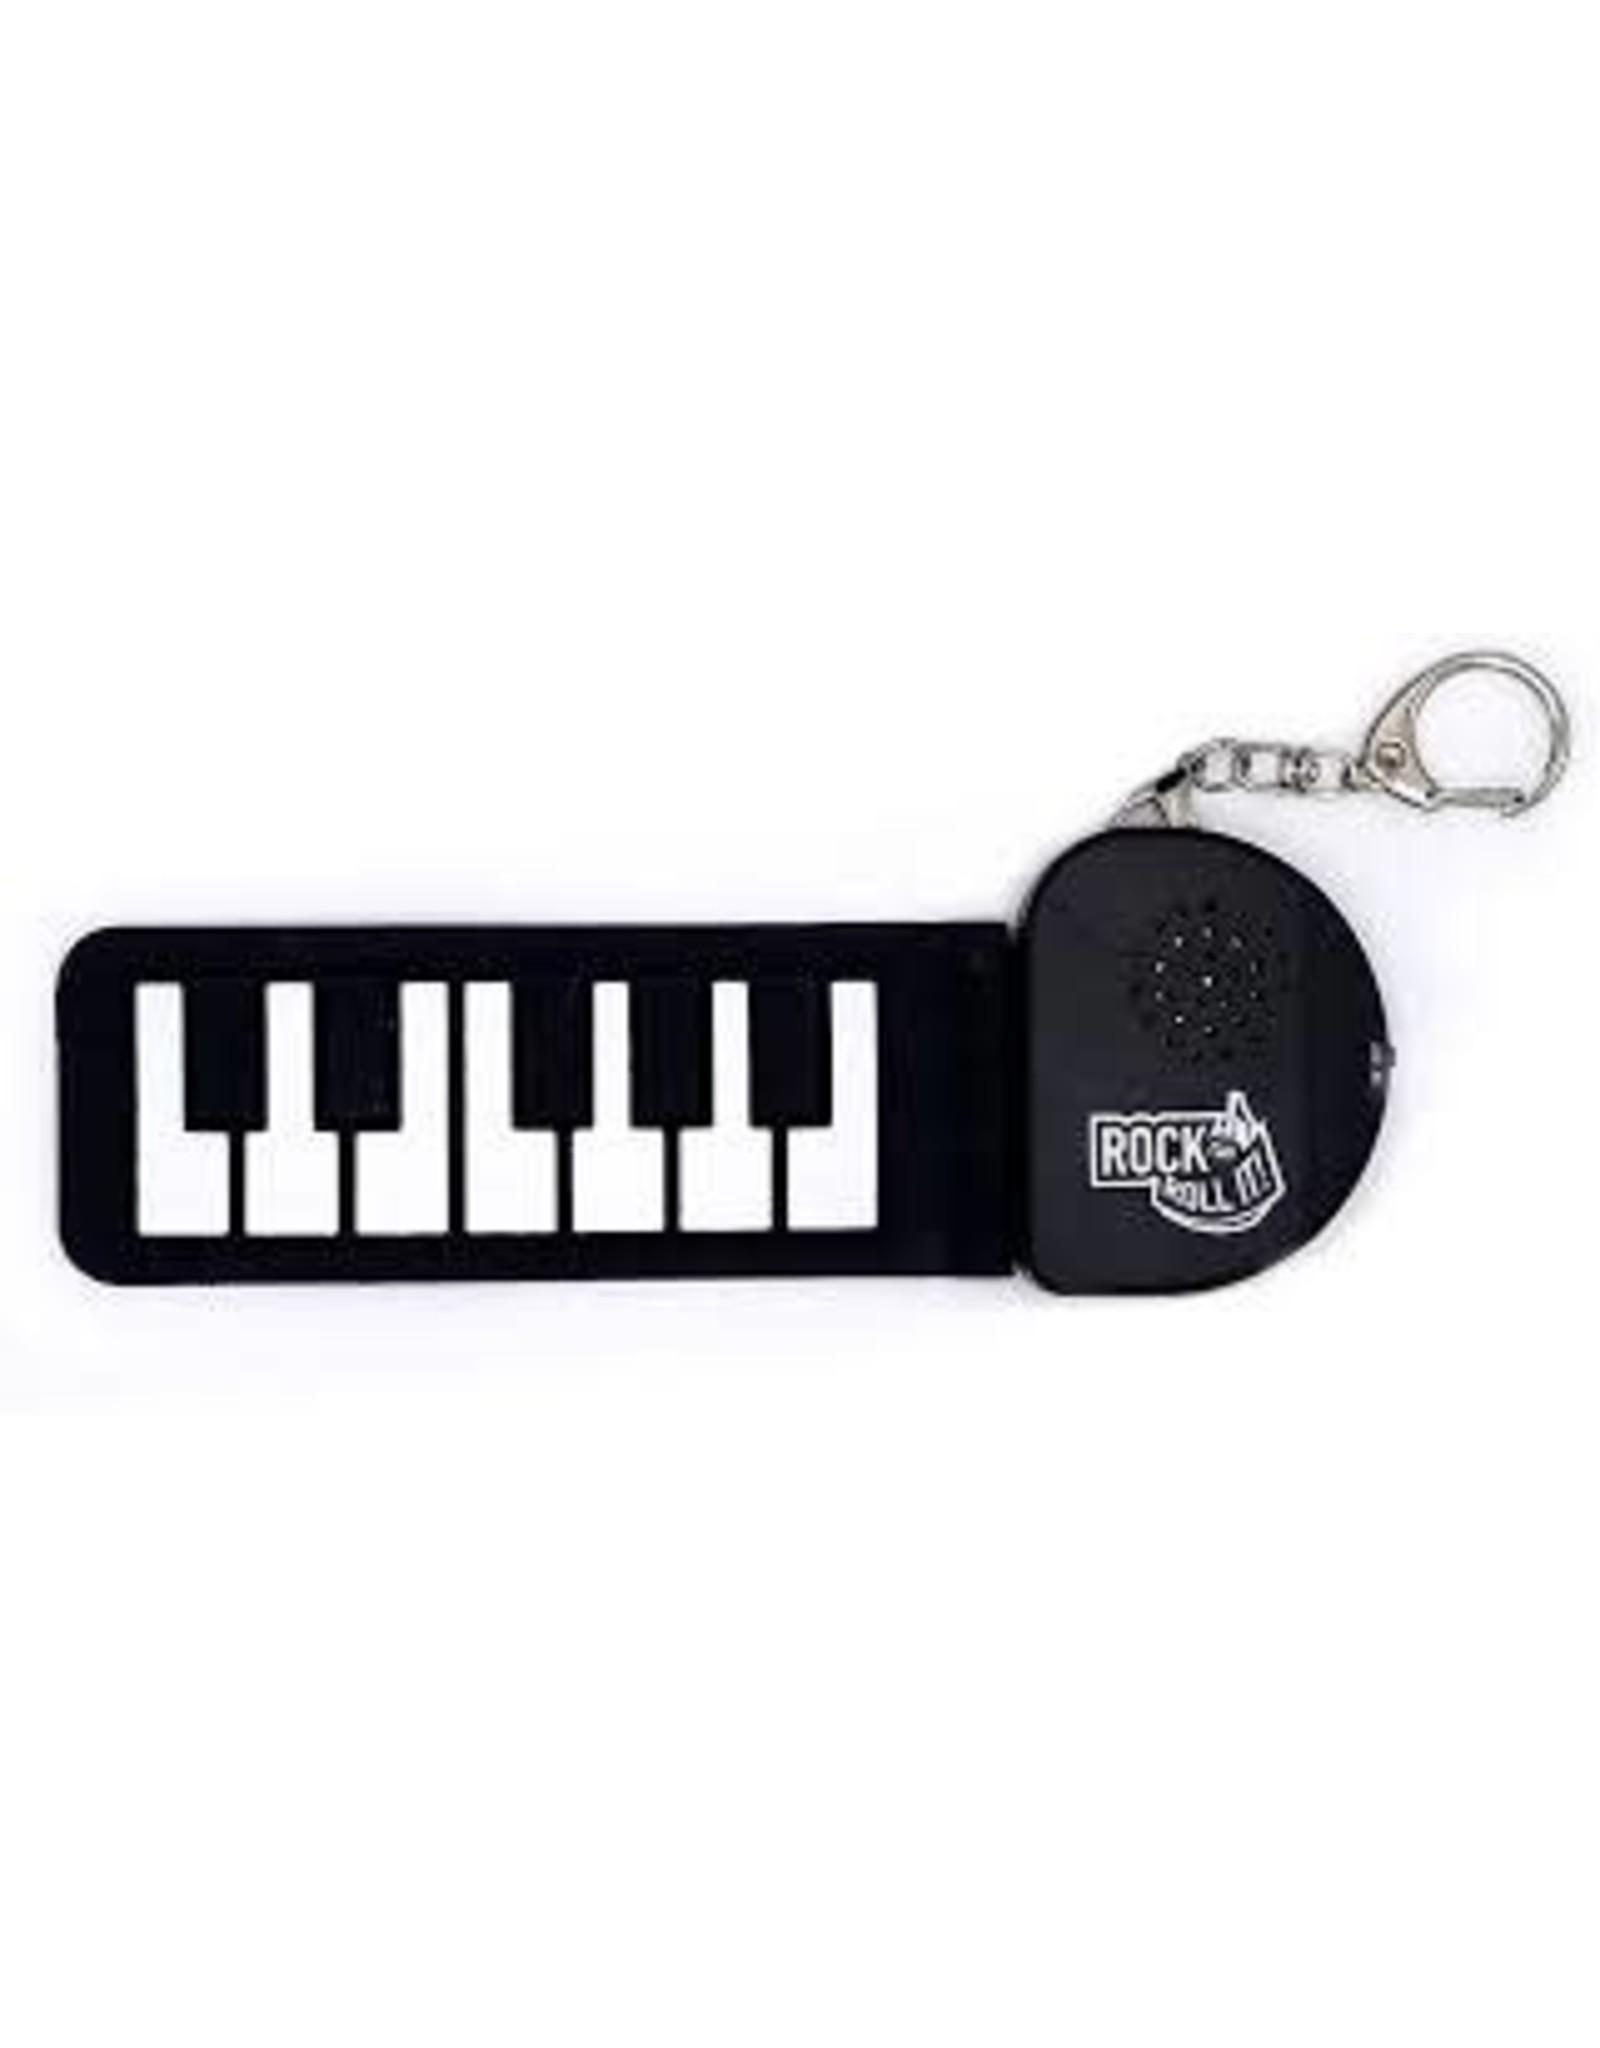 Mukikim Rock N' Roll It! Micro Classic Piano